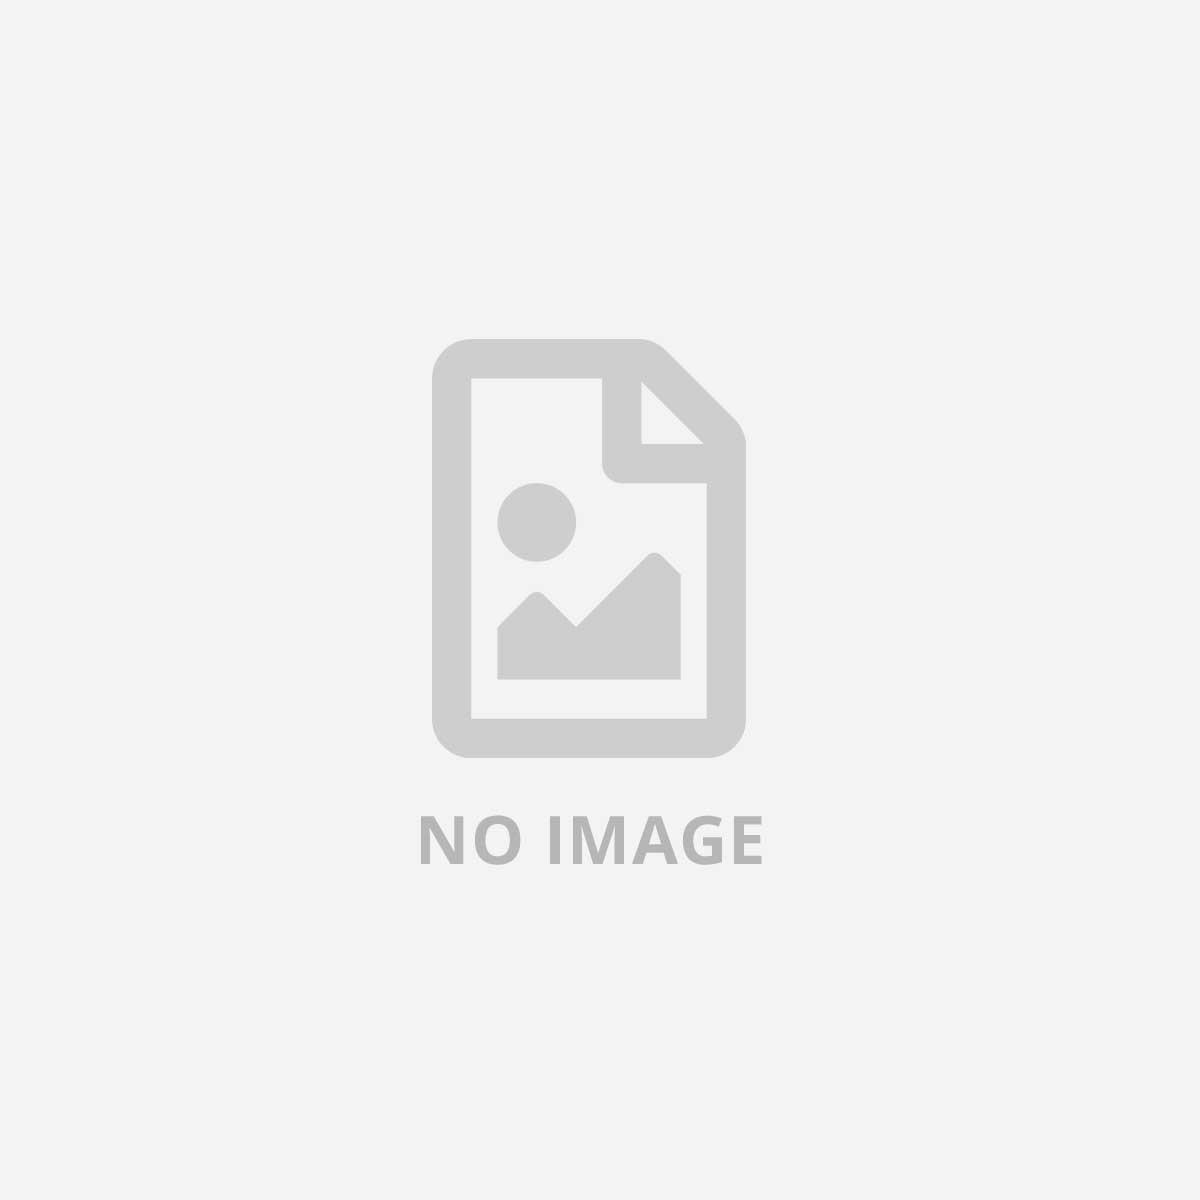 ATEN 16-PORT 17  LCD KVM SWITCH (USB - P